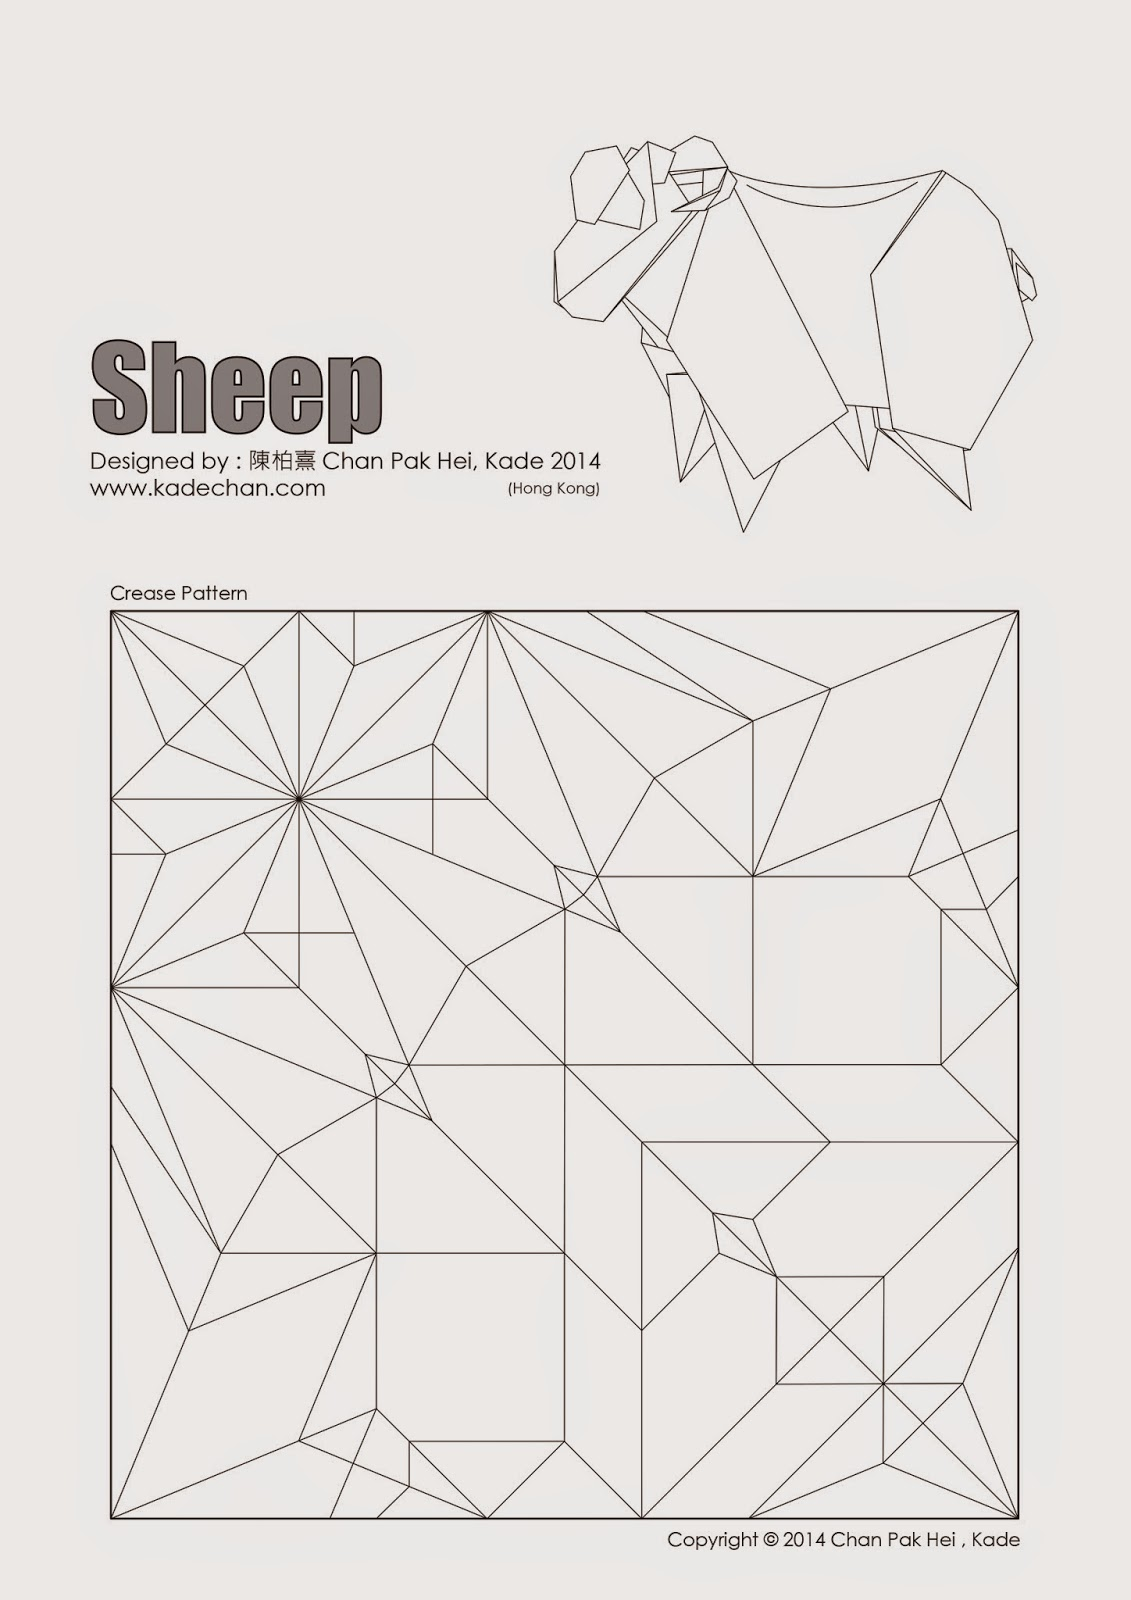 kade chan origami blog  u9999 u6e2f u647a u7d19 u5de5 u4f5c u5ba4   u65e5 u8a8c   origami sheep  u7dbf u7f8a